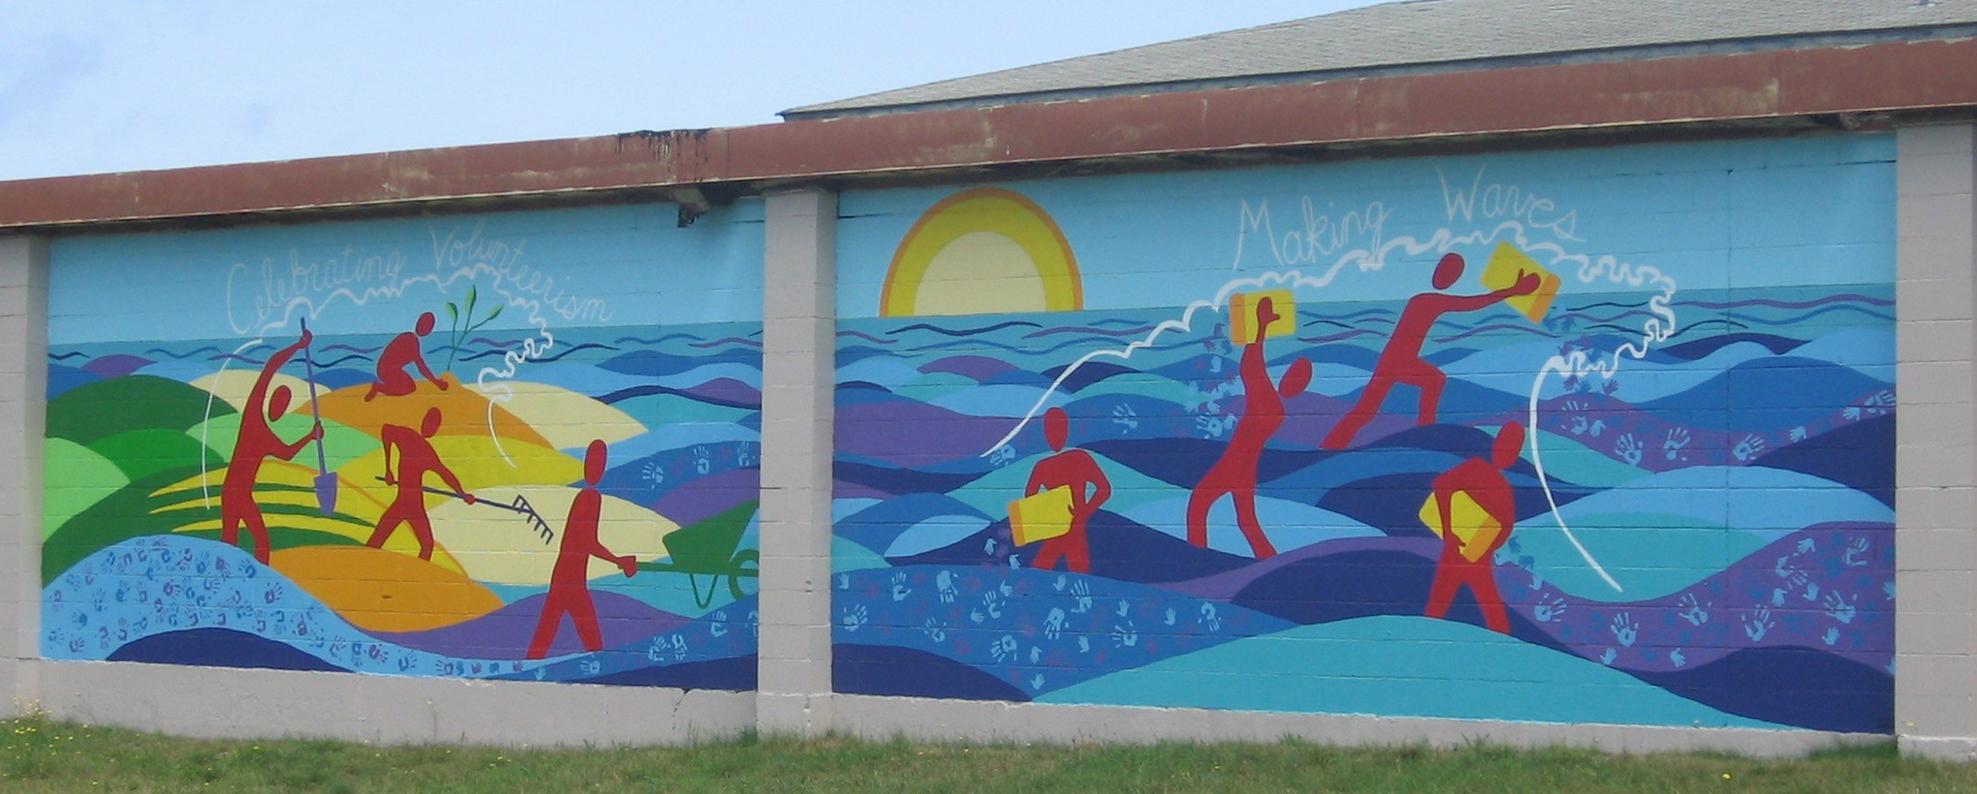 Making waves cape cod national seashore u s national for Abri mural cape cod